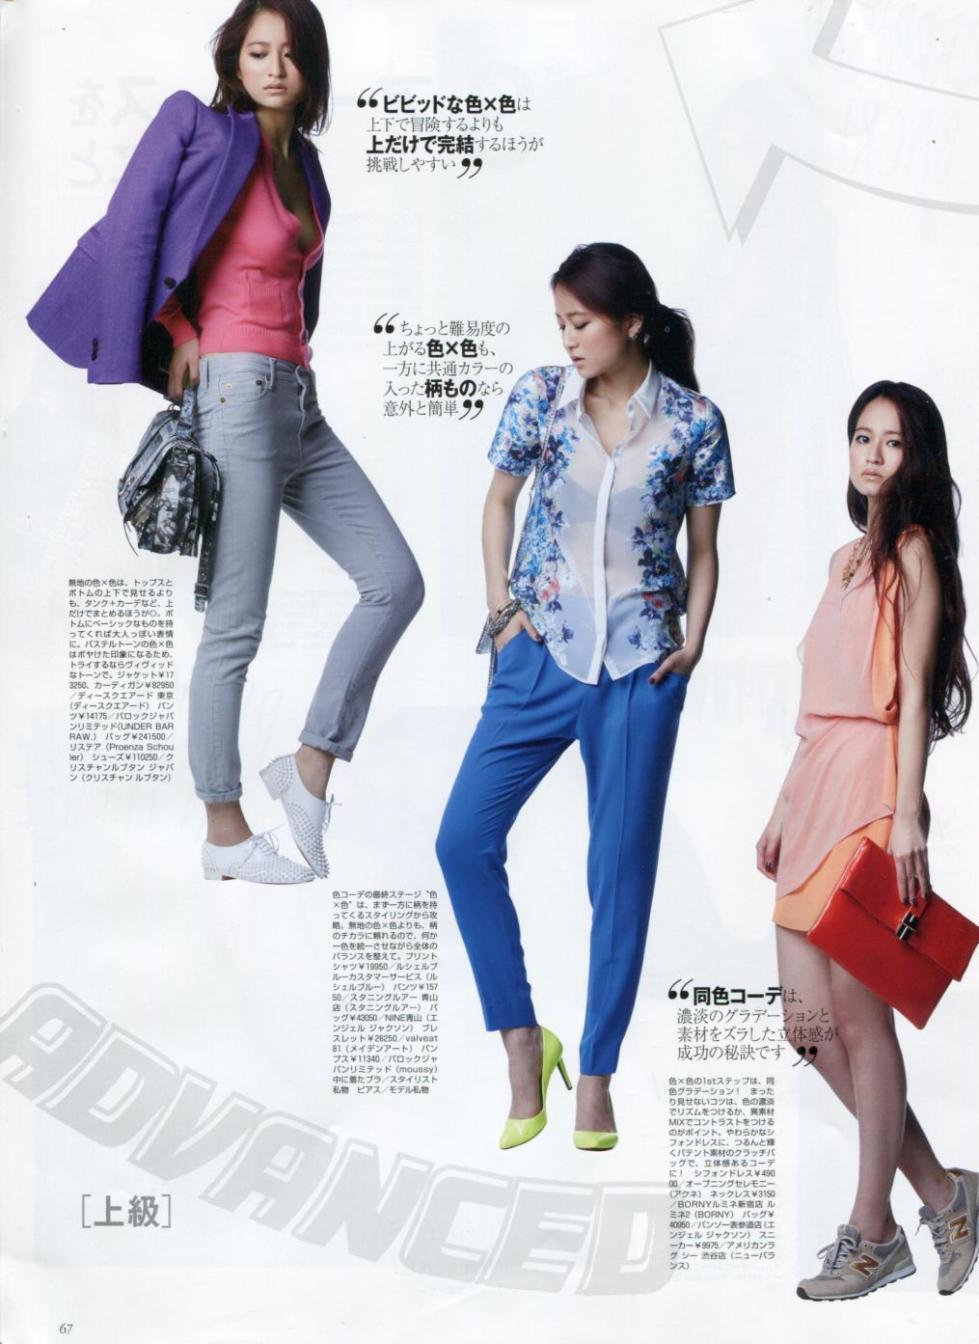 Glamorous JAP 2013-5-1 pag 67